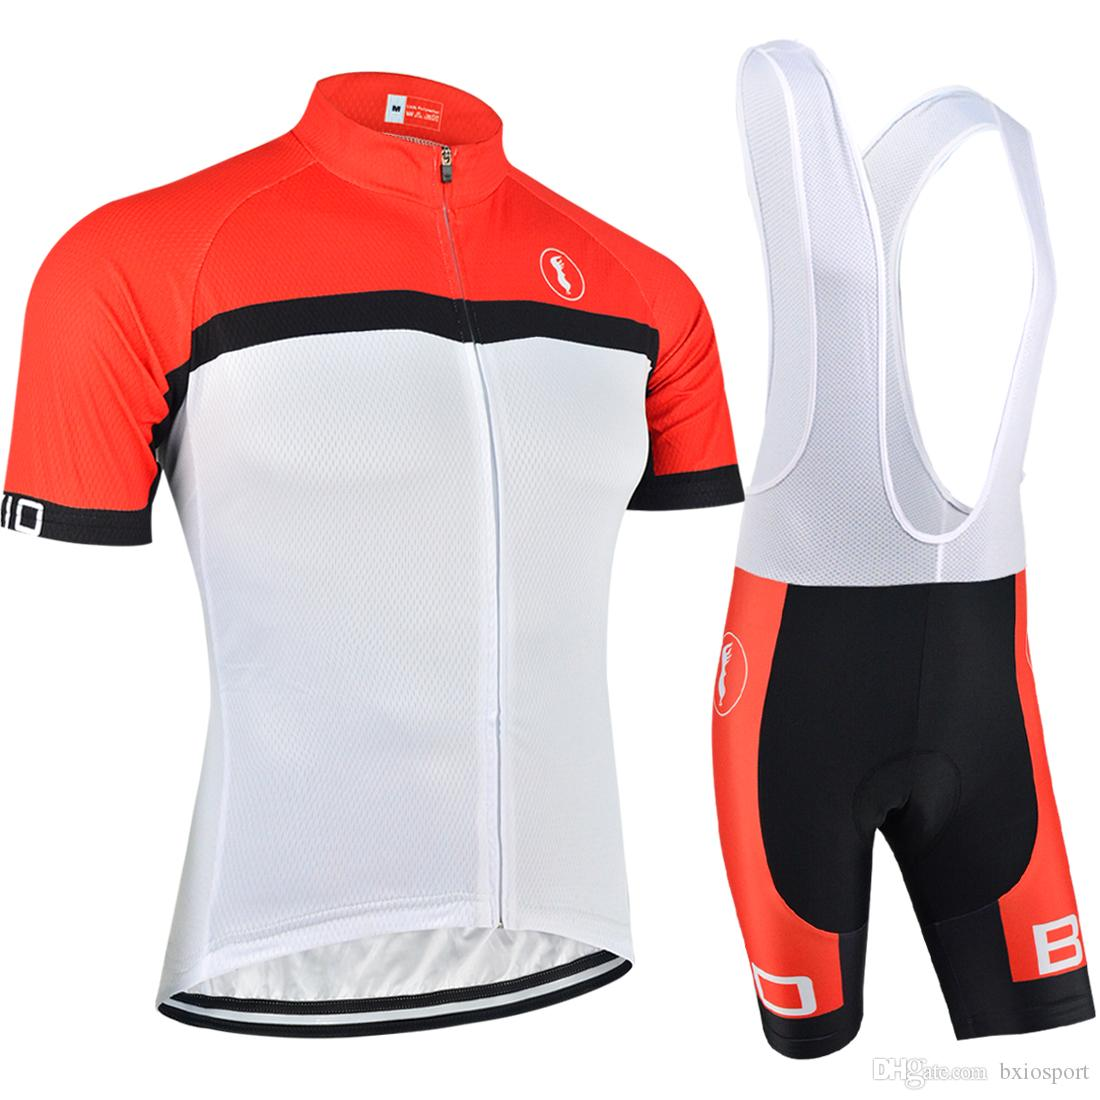 Panda Fashion Cycling Bike Short Sleeve Clothing Set Jersey Bib Shorts S-3XL